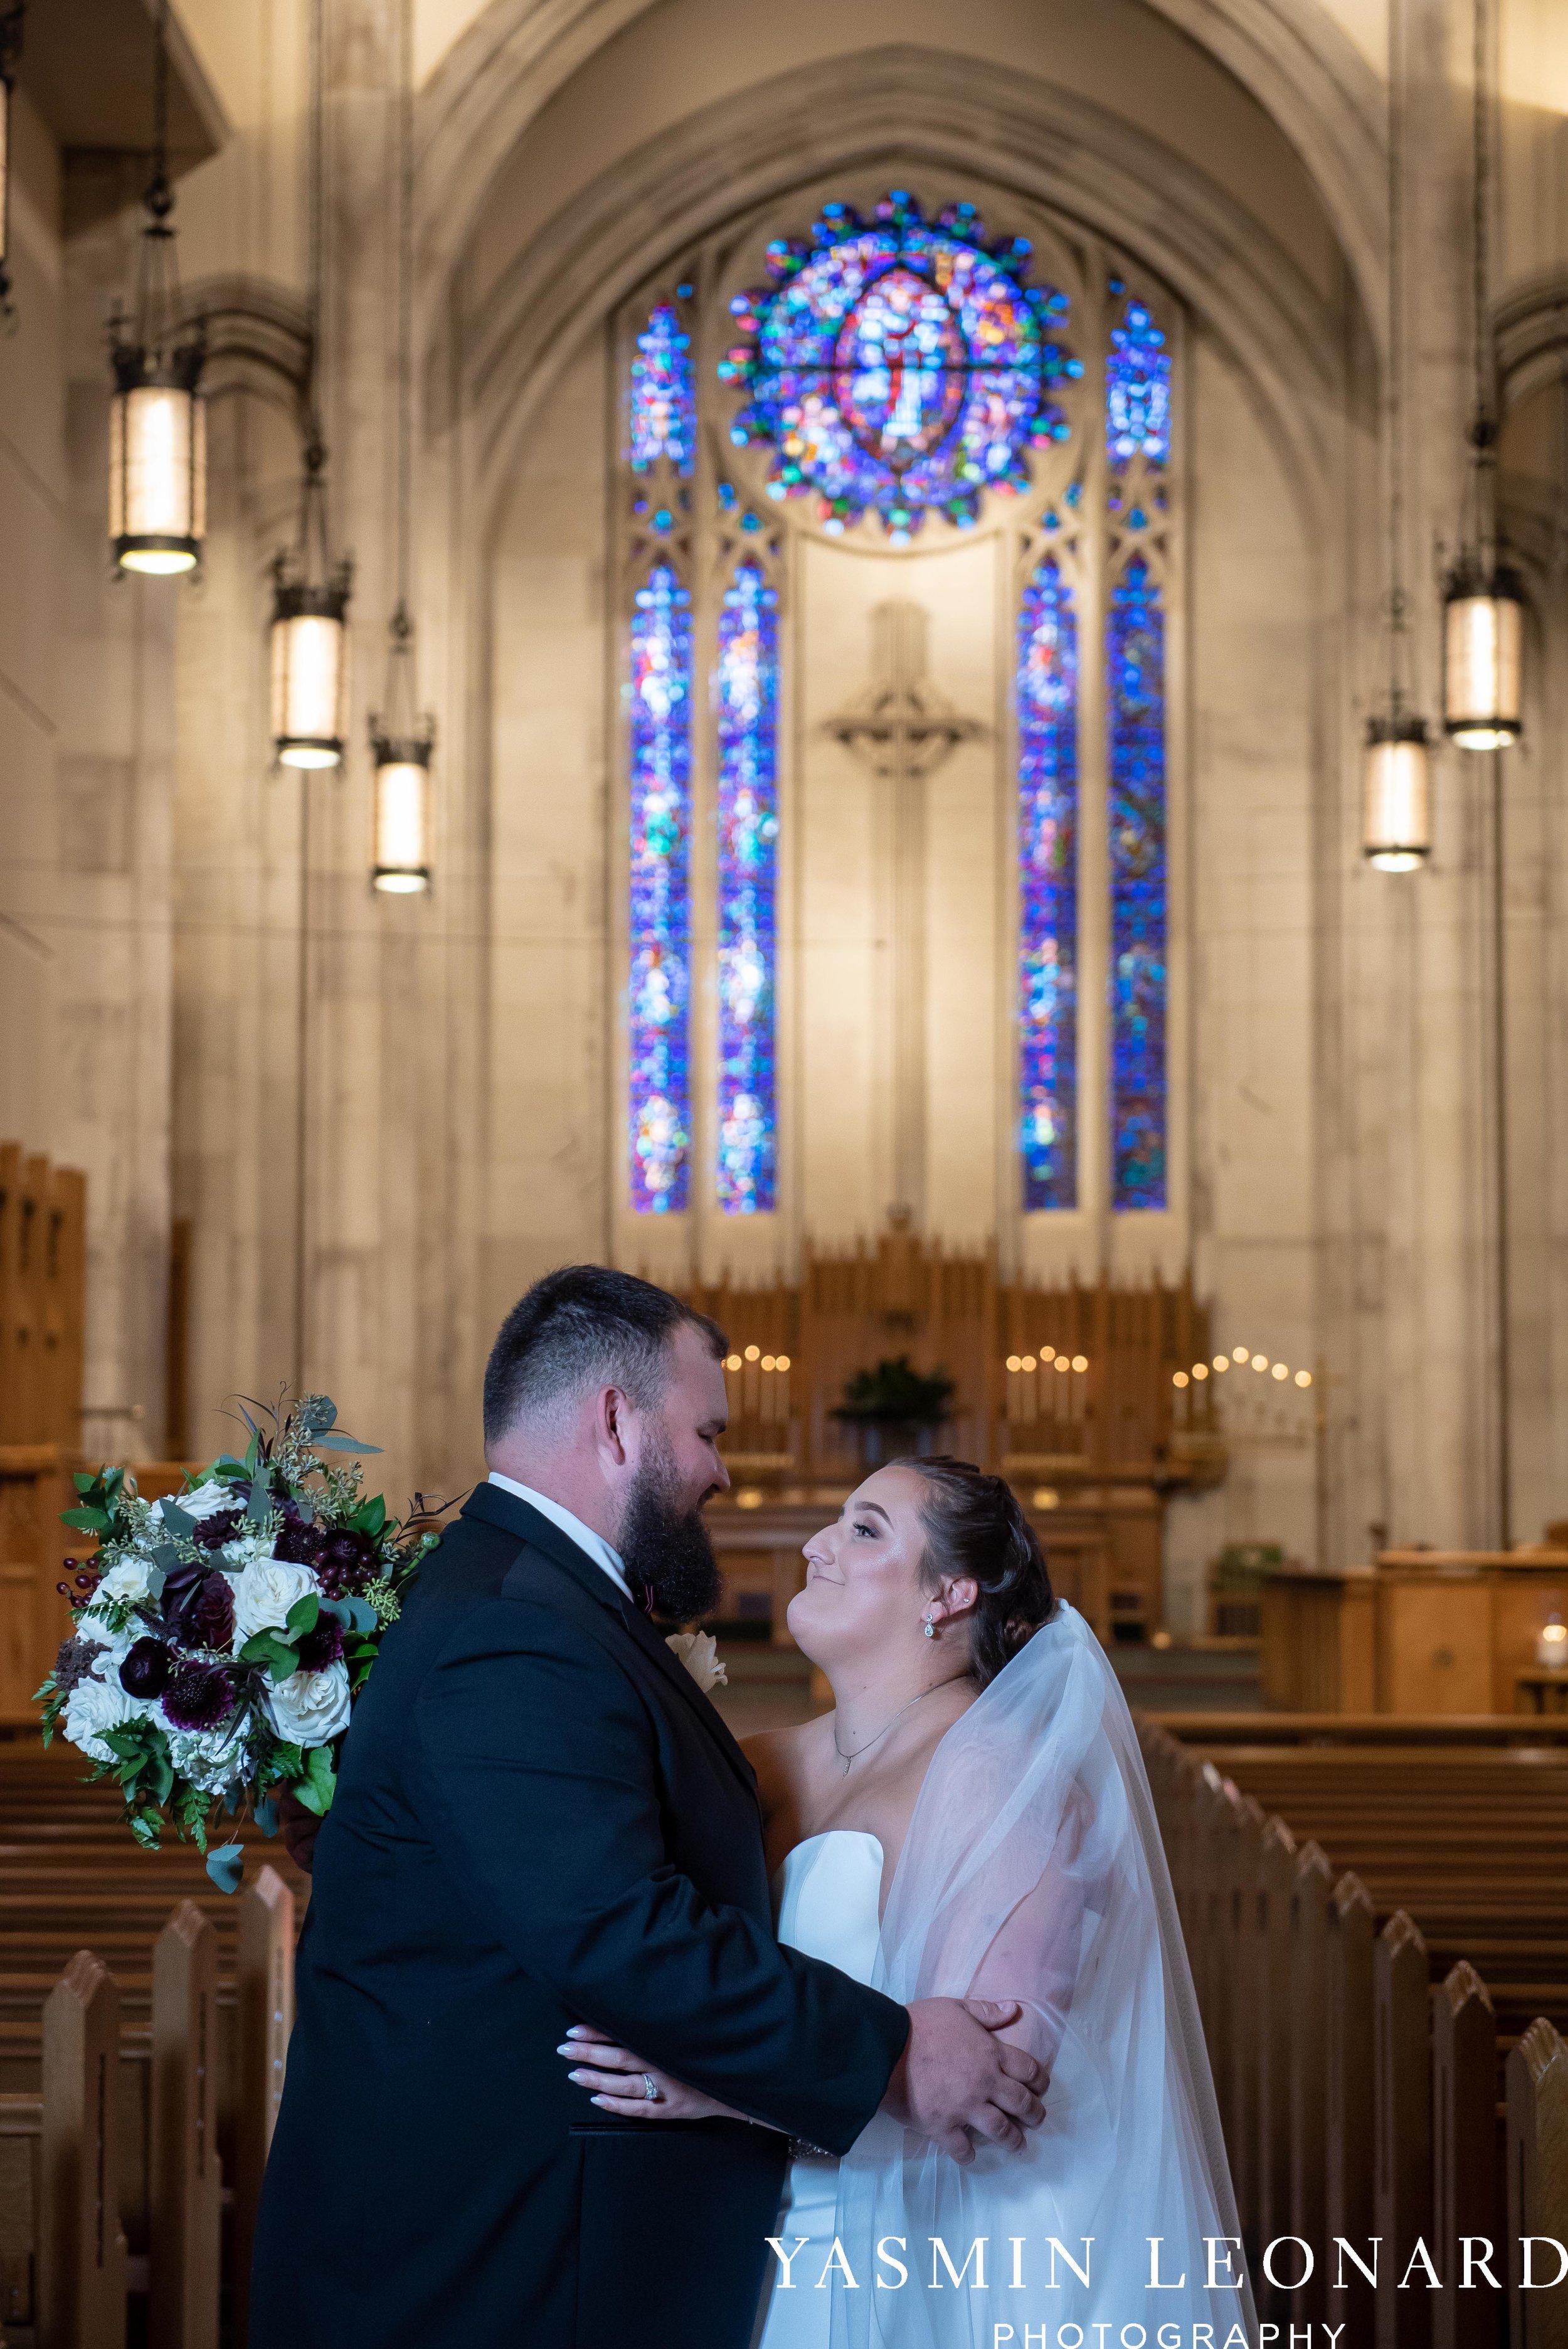 Wesley Memorial United Methodist Church - Old Homeplace Winery - High Point Weddings - High Point Wedding Photographer - NC Weddings - NC Barn Venue - Yasmin Leonard Photography-26.jpg